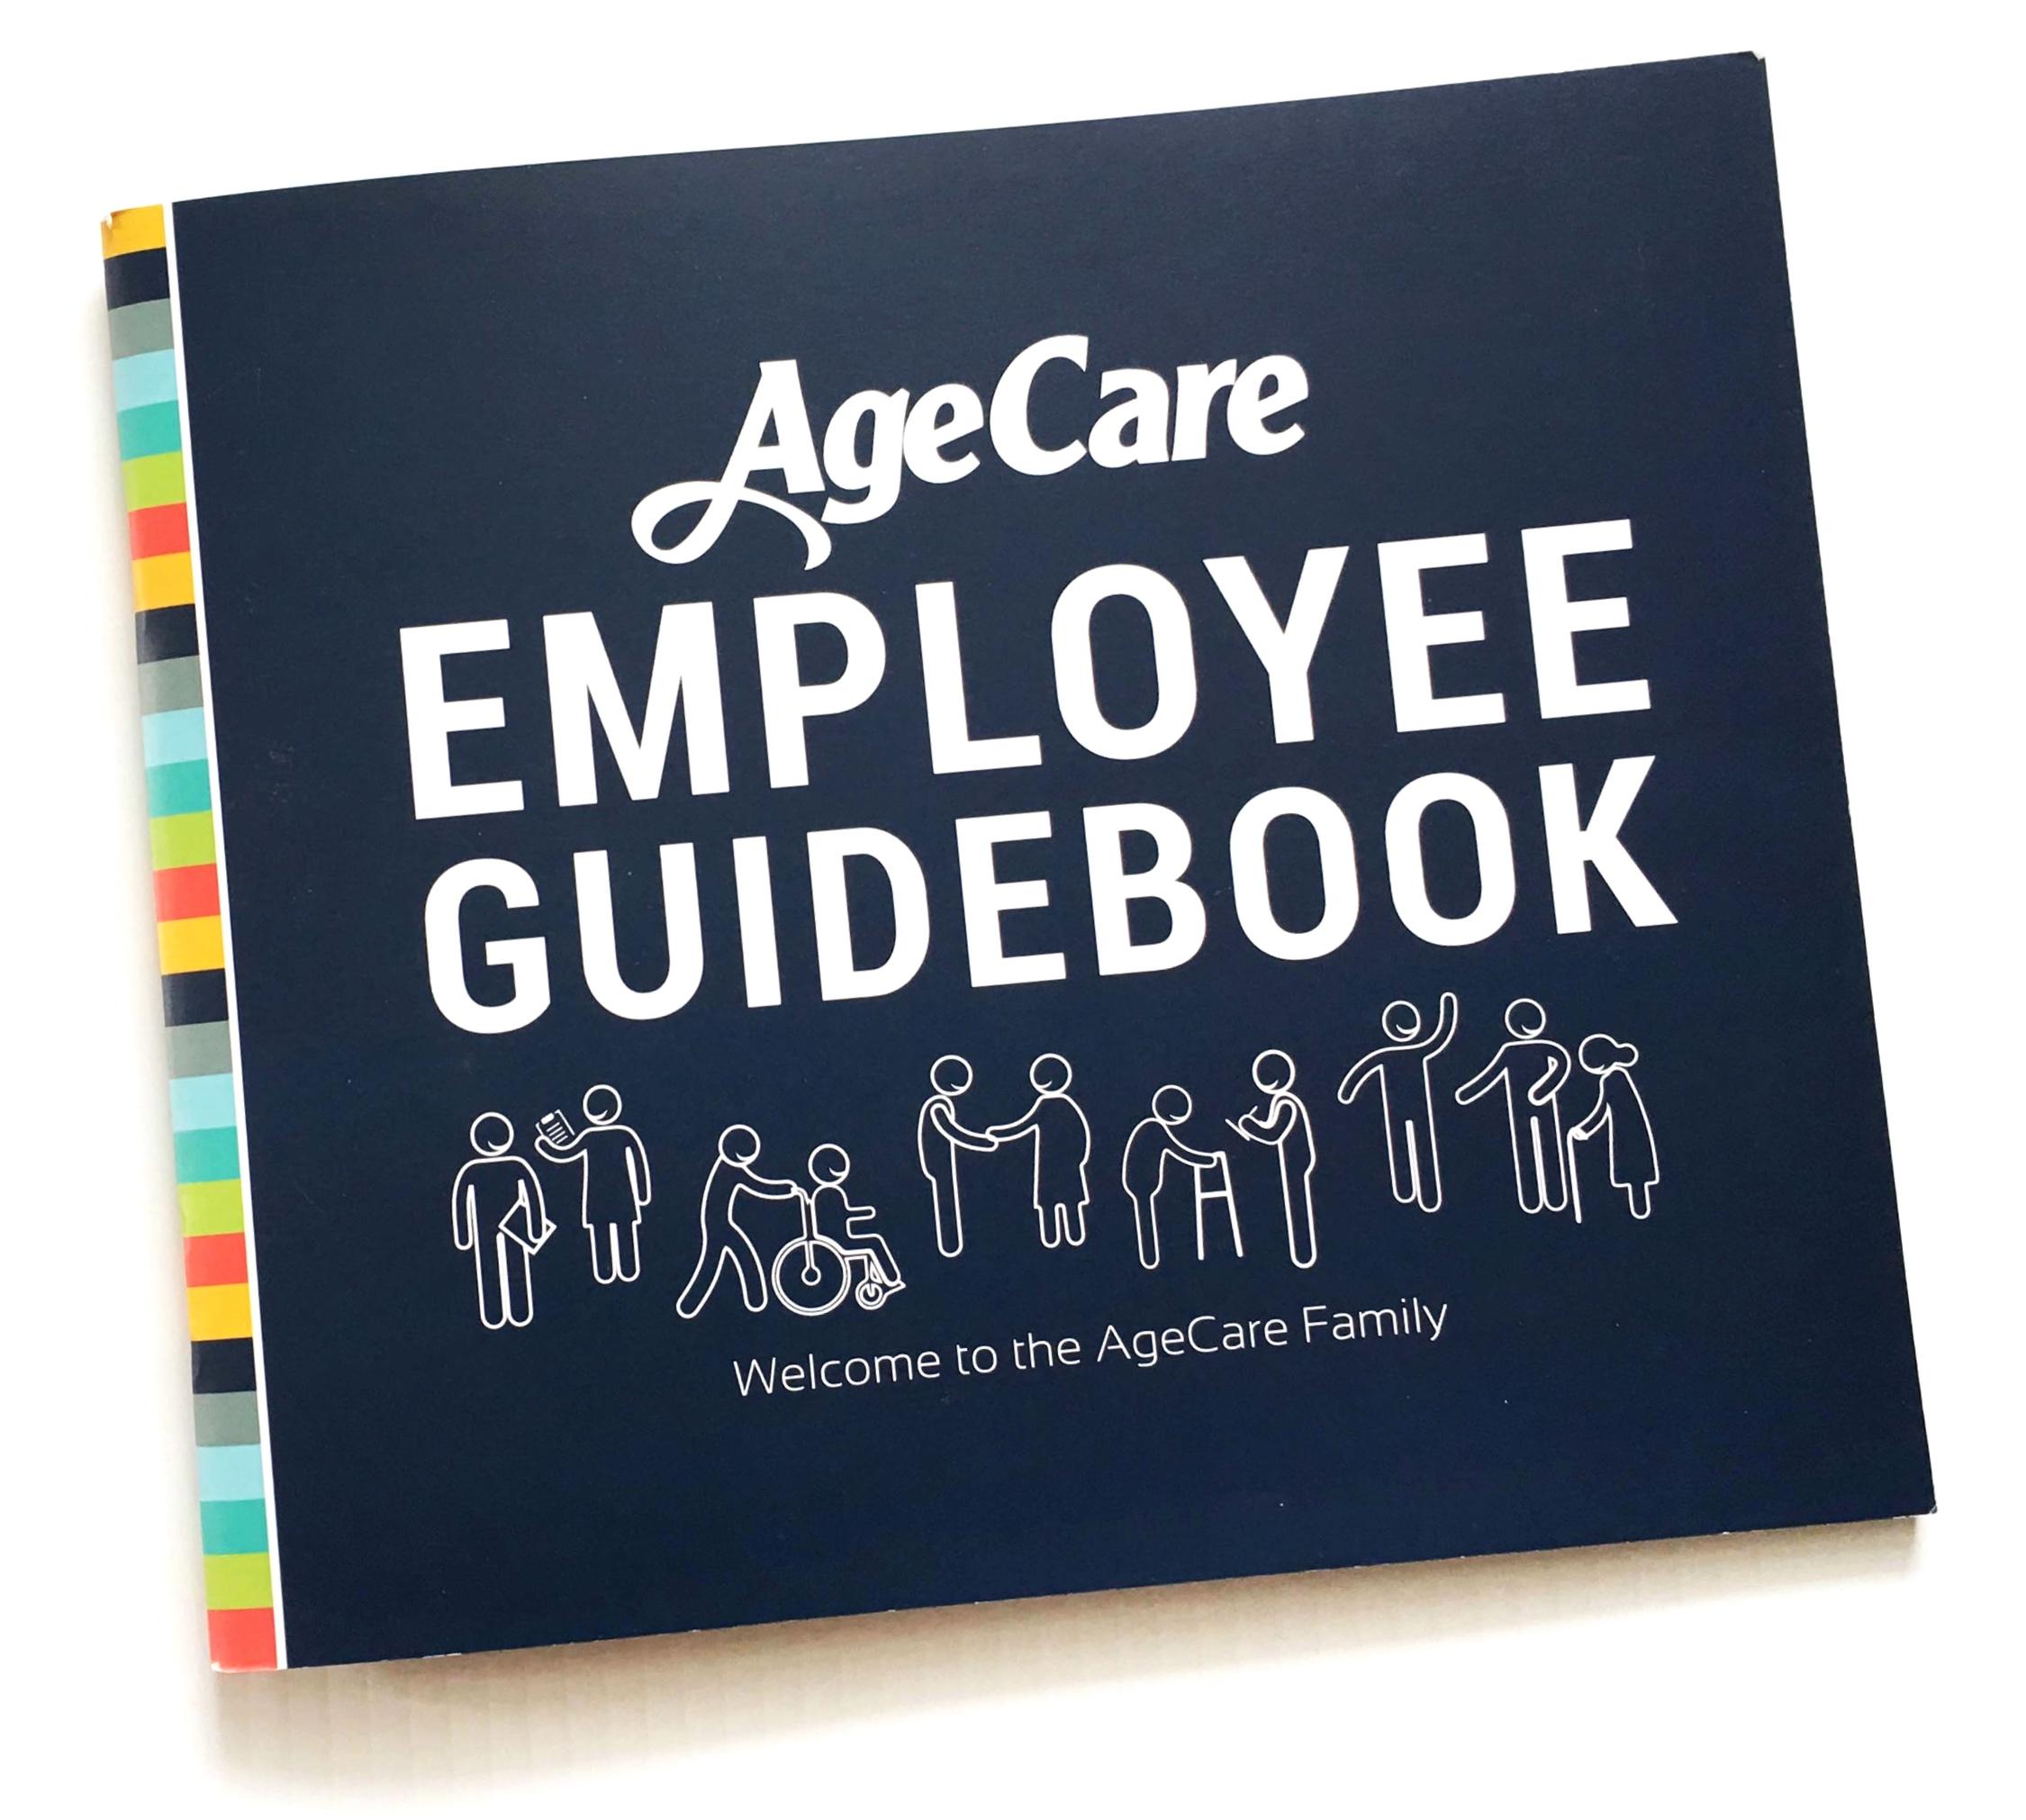 AgeCare_Employee_Guide.jpg